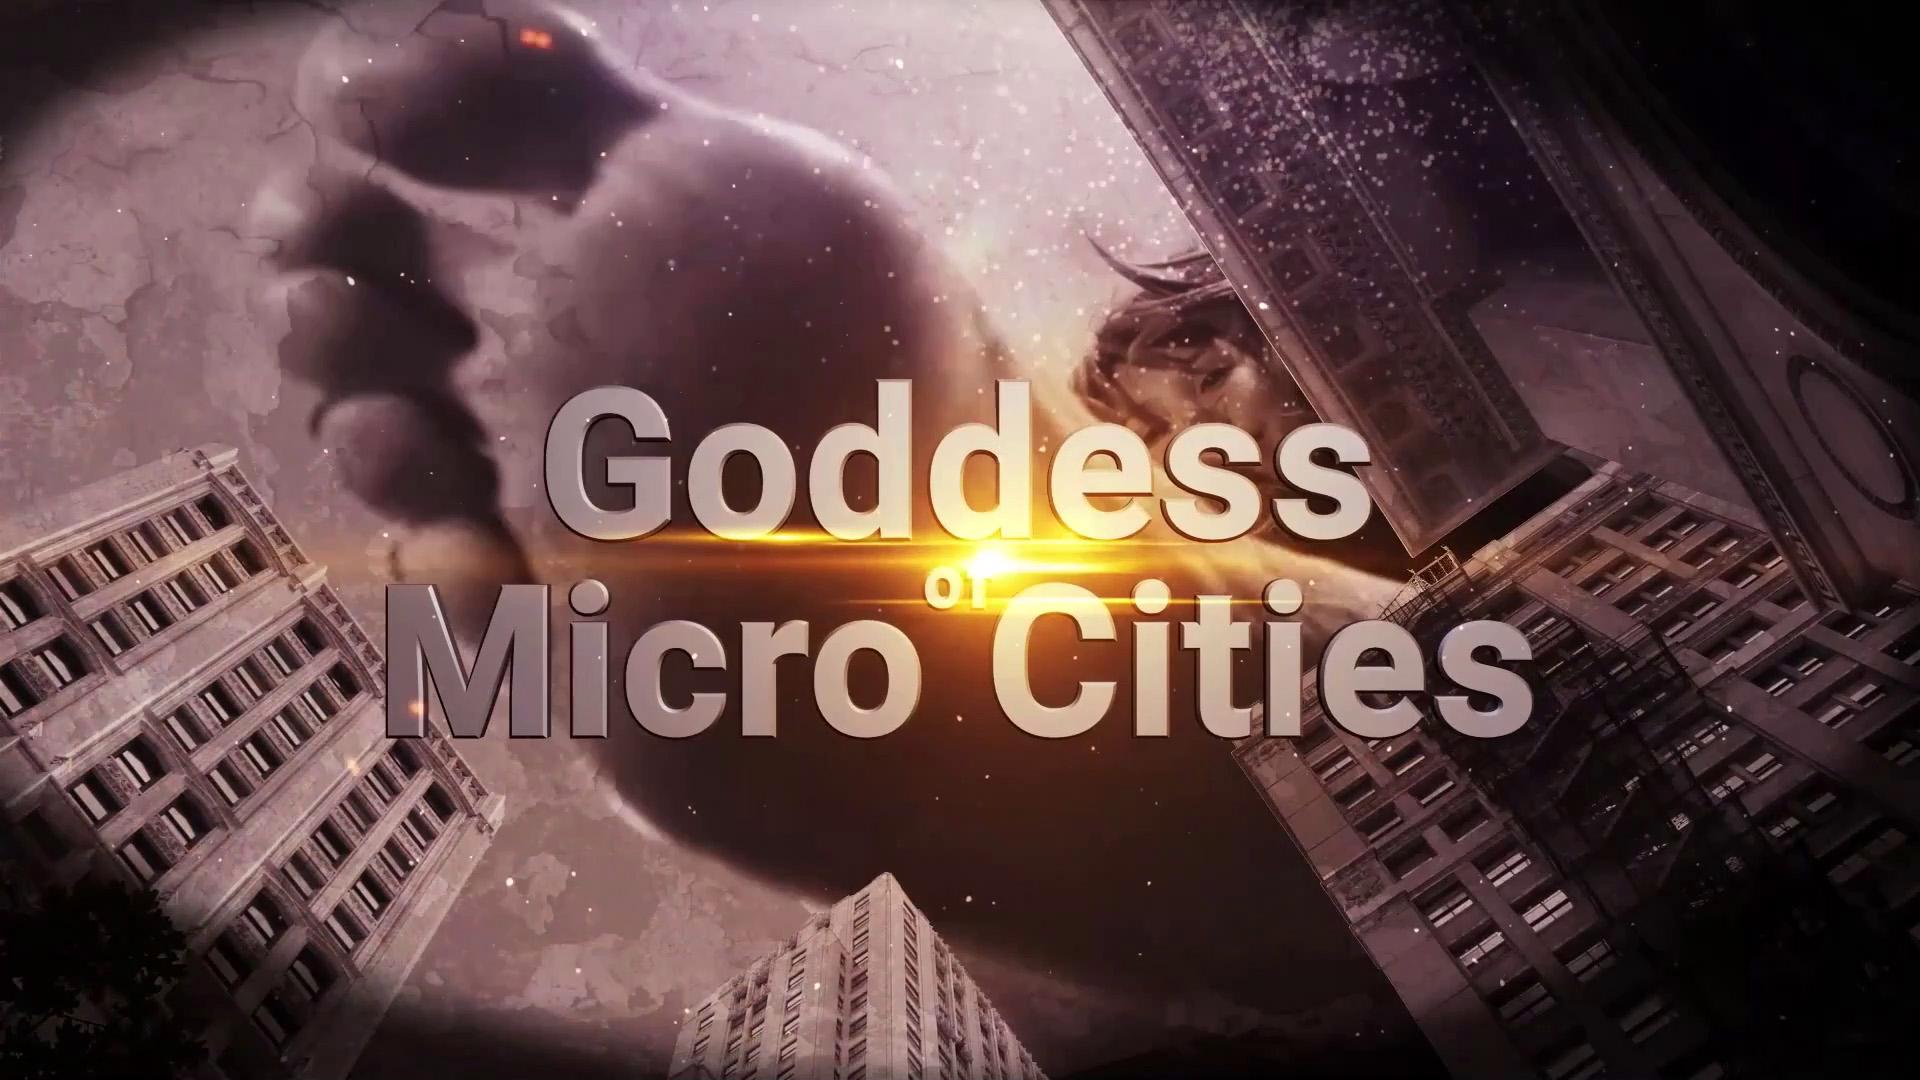 giantess loryelle goddess micro cities sfx foot fetish vore butt